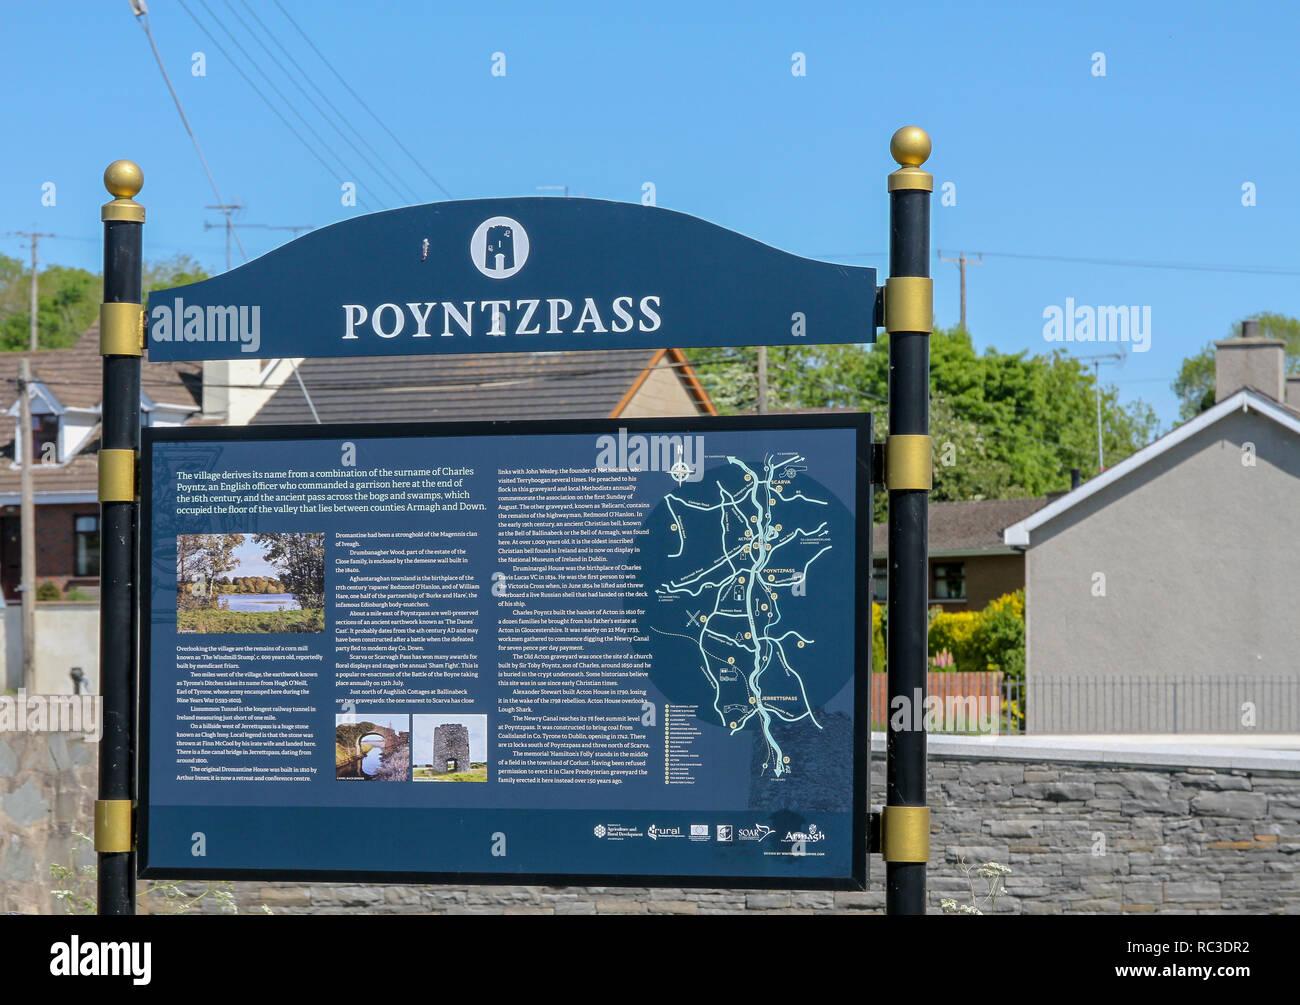 Northern Ireland village information sign at Poyntzpass, County Down, Northern Ireland. - Stock Image